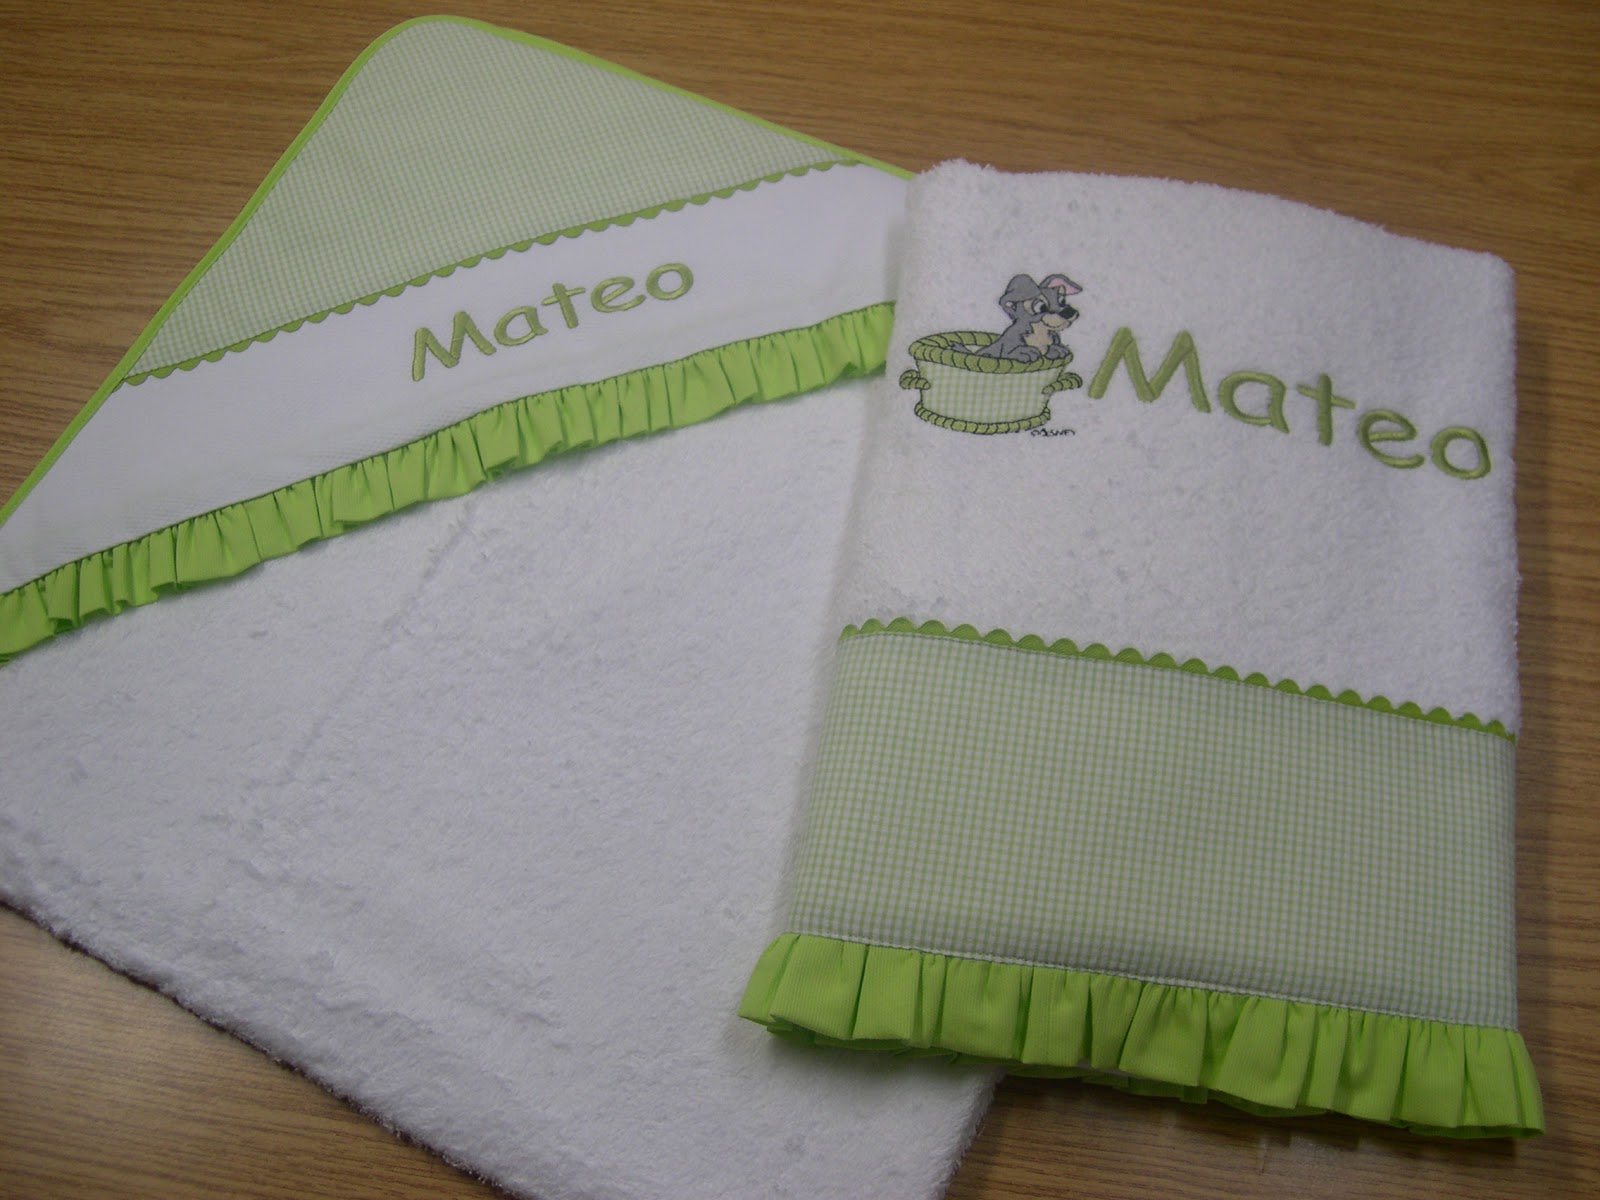 Bordaym s complementos infantiles sacos personalizados - Toallas infantiles personalizadas ...